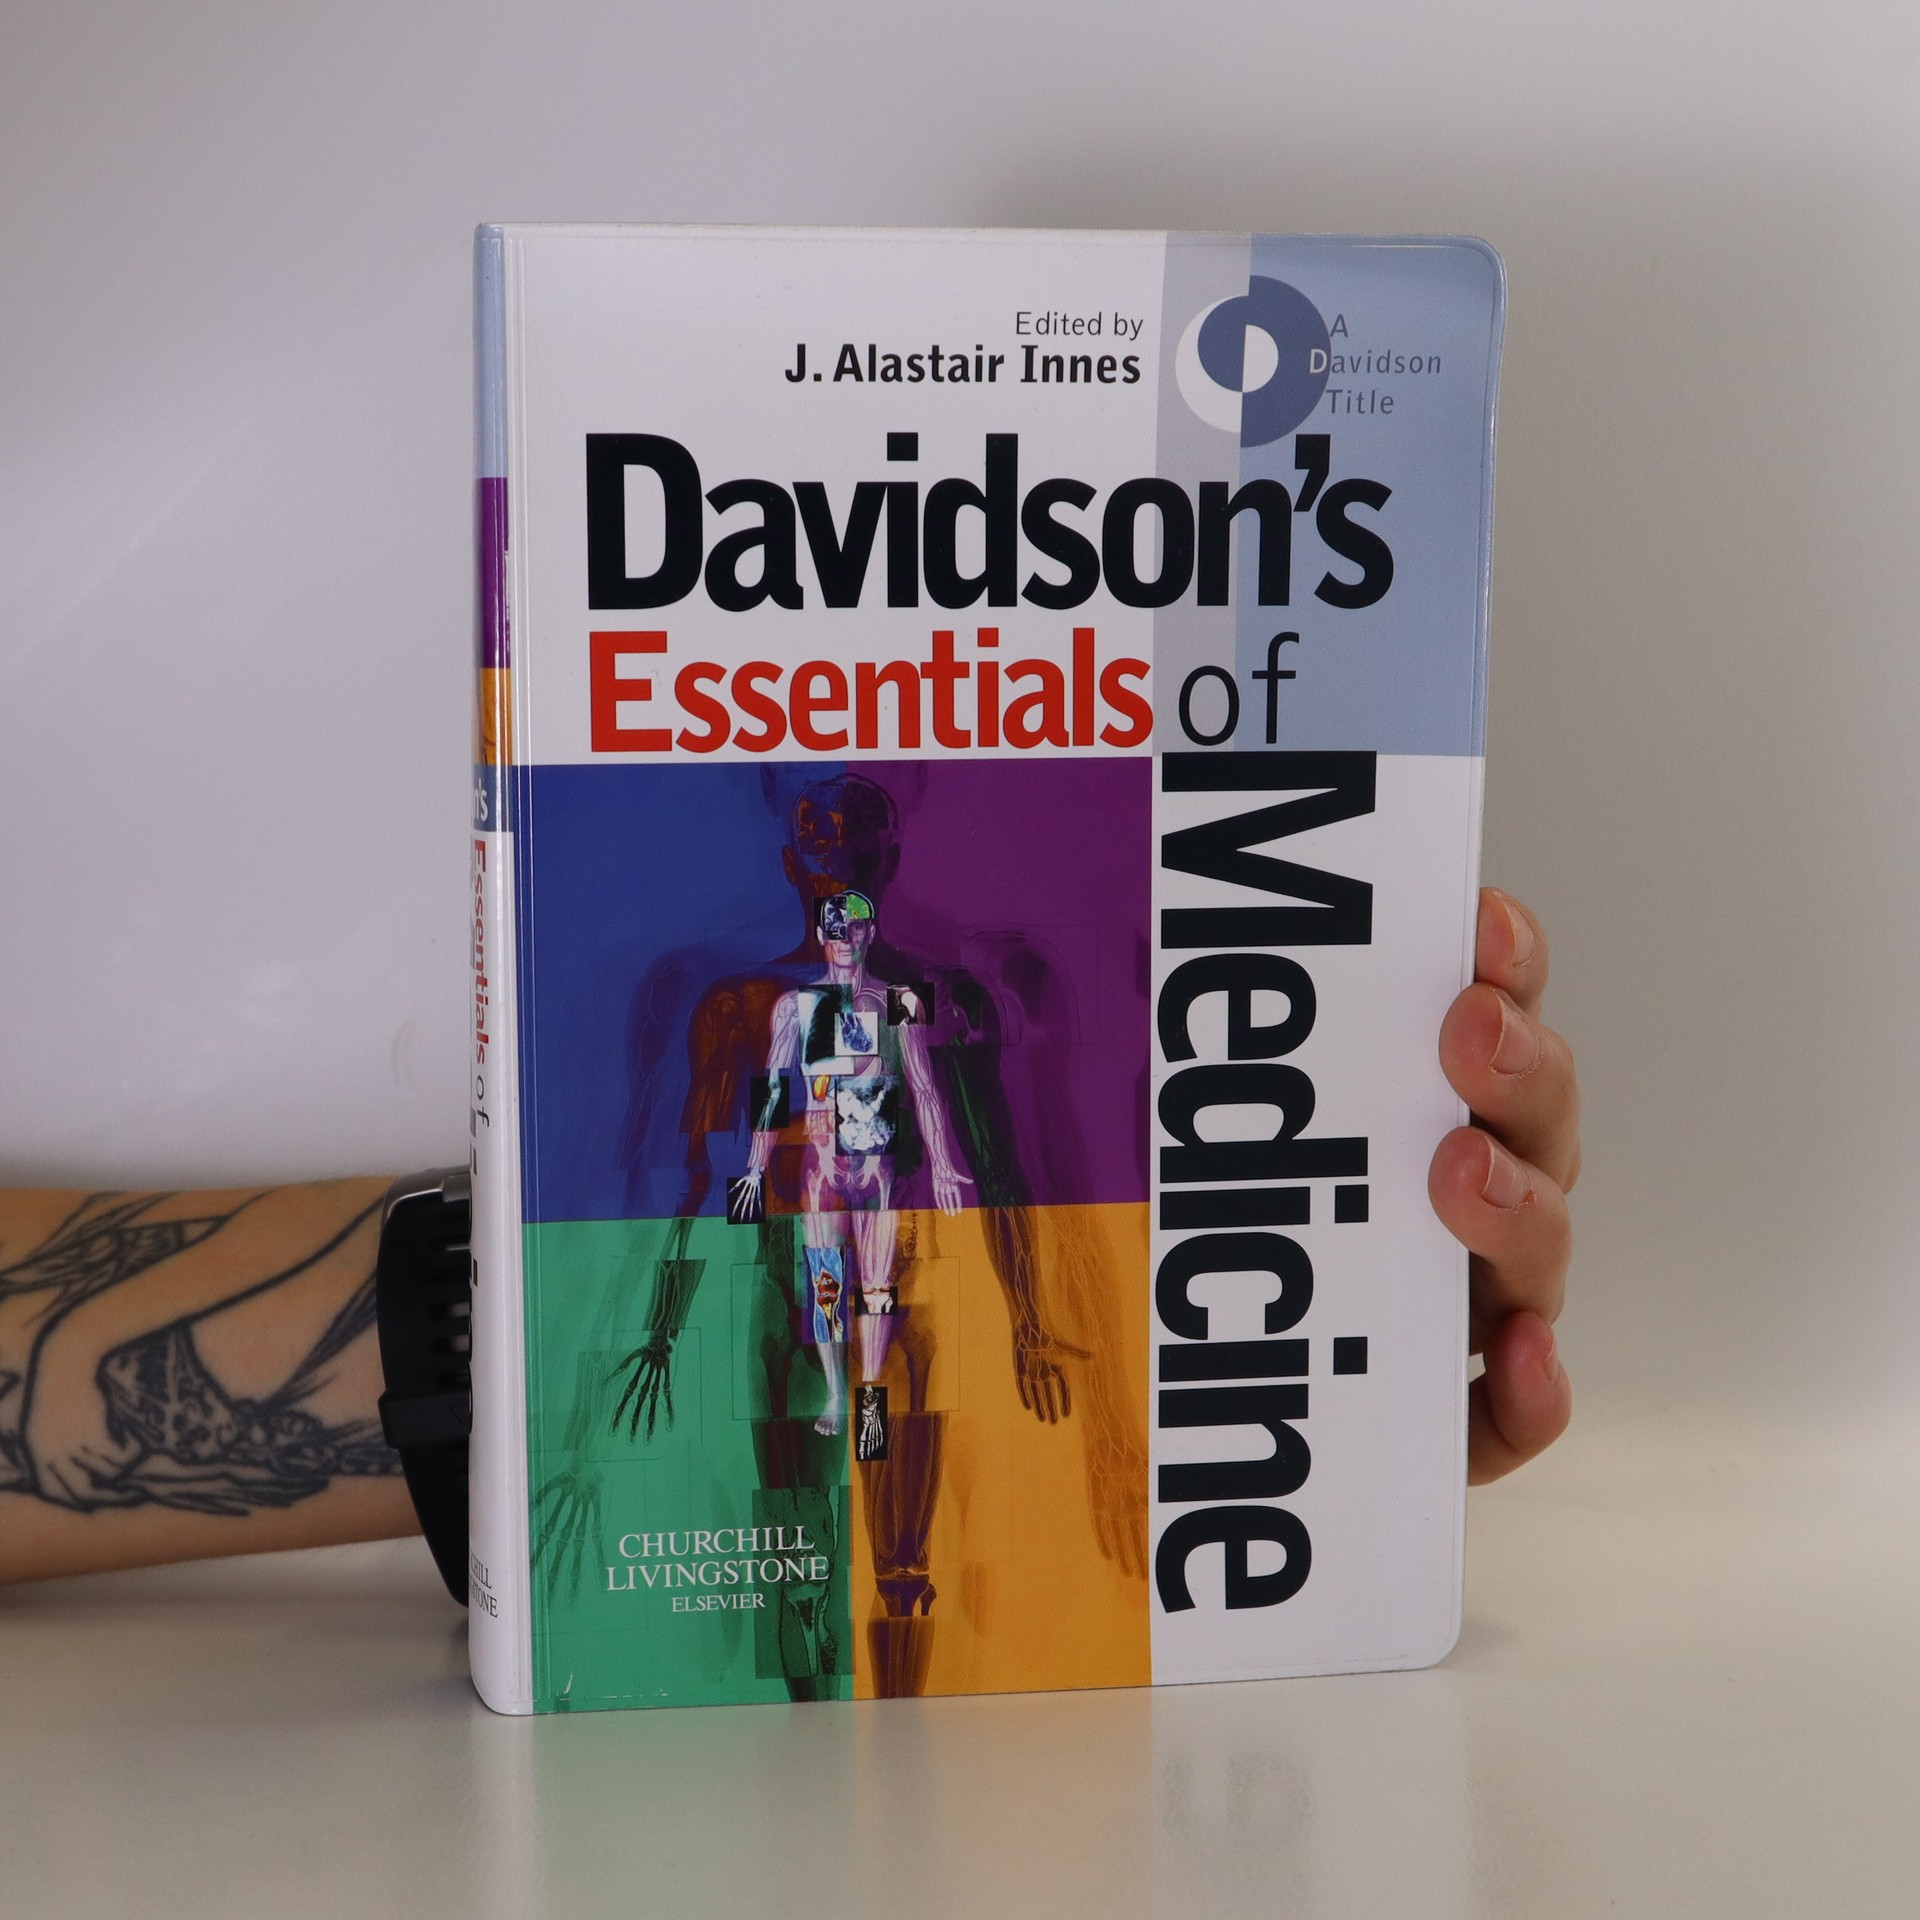 antikvární kniha Davidson's essentials of medicine, 2011